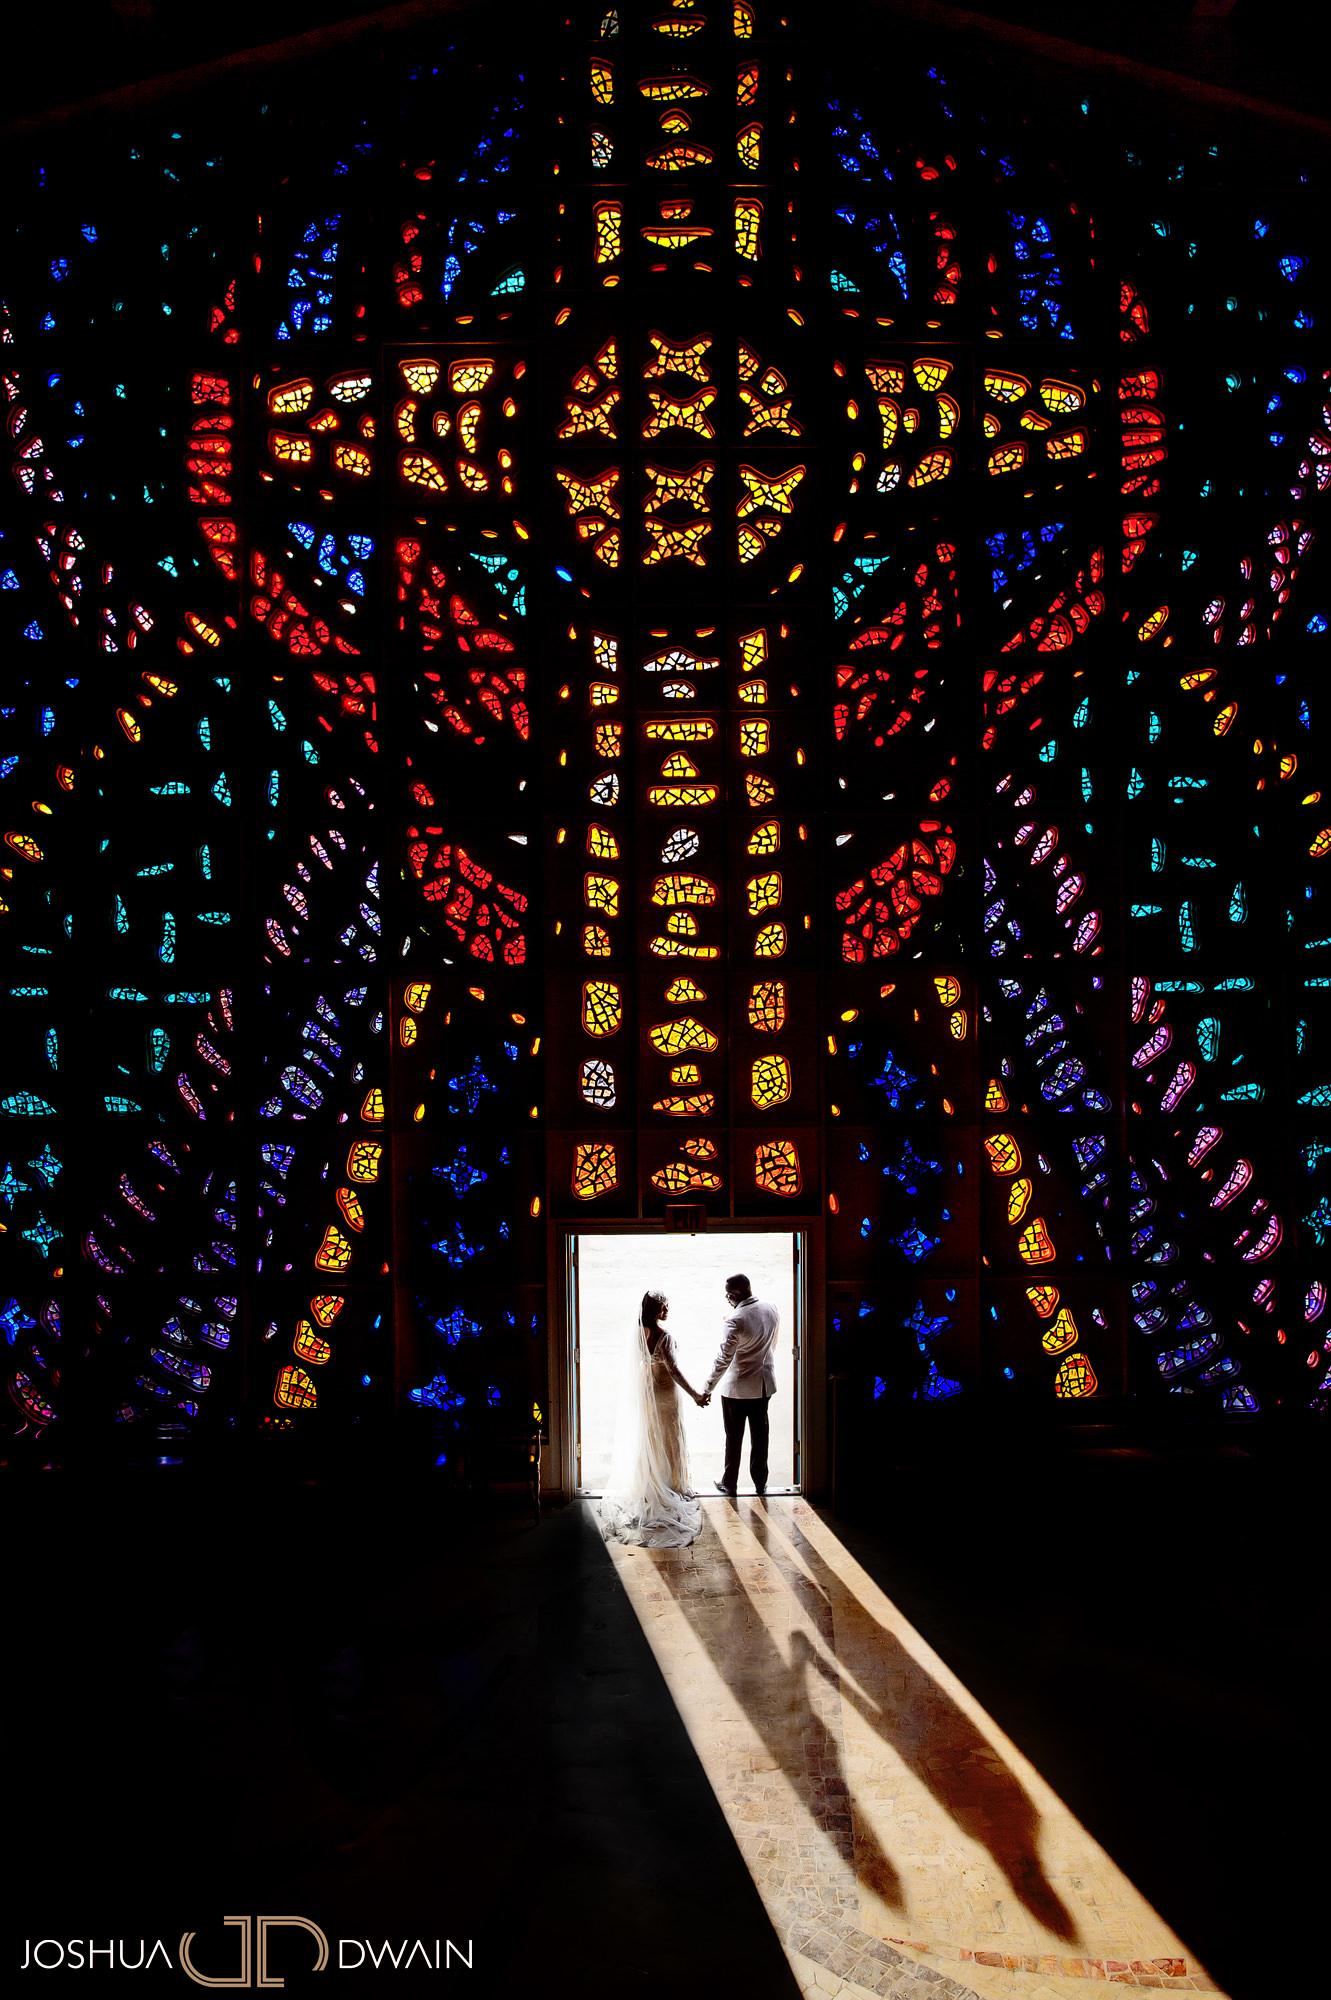 joshua-dwain-weddings-gallery-best-wedding-photographers-us-029